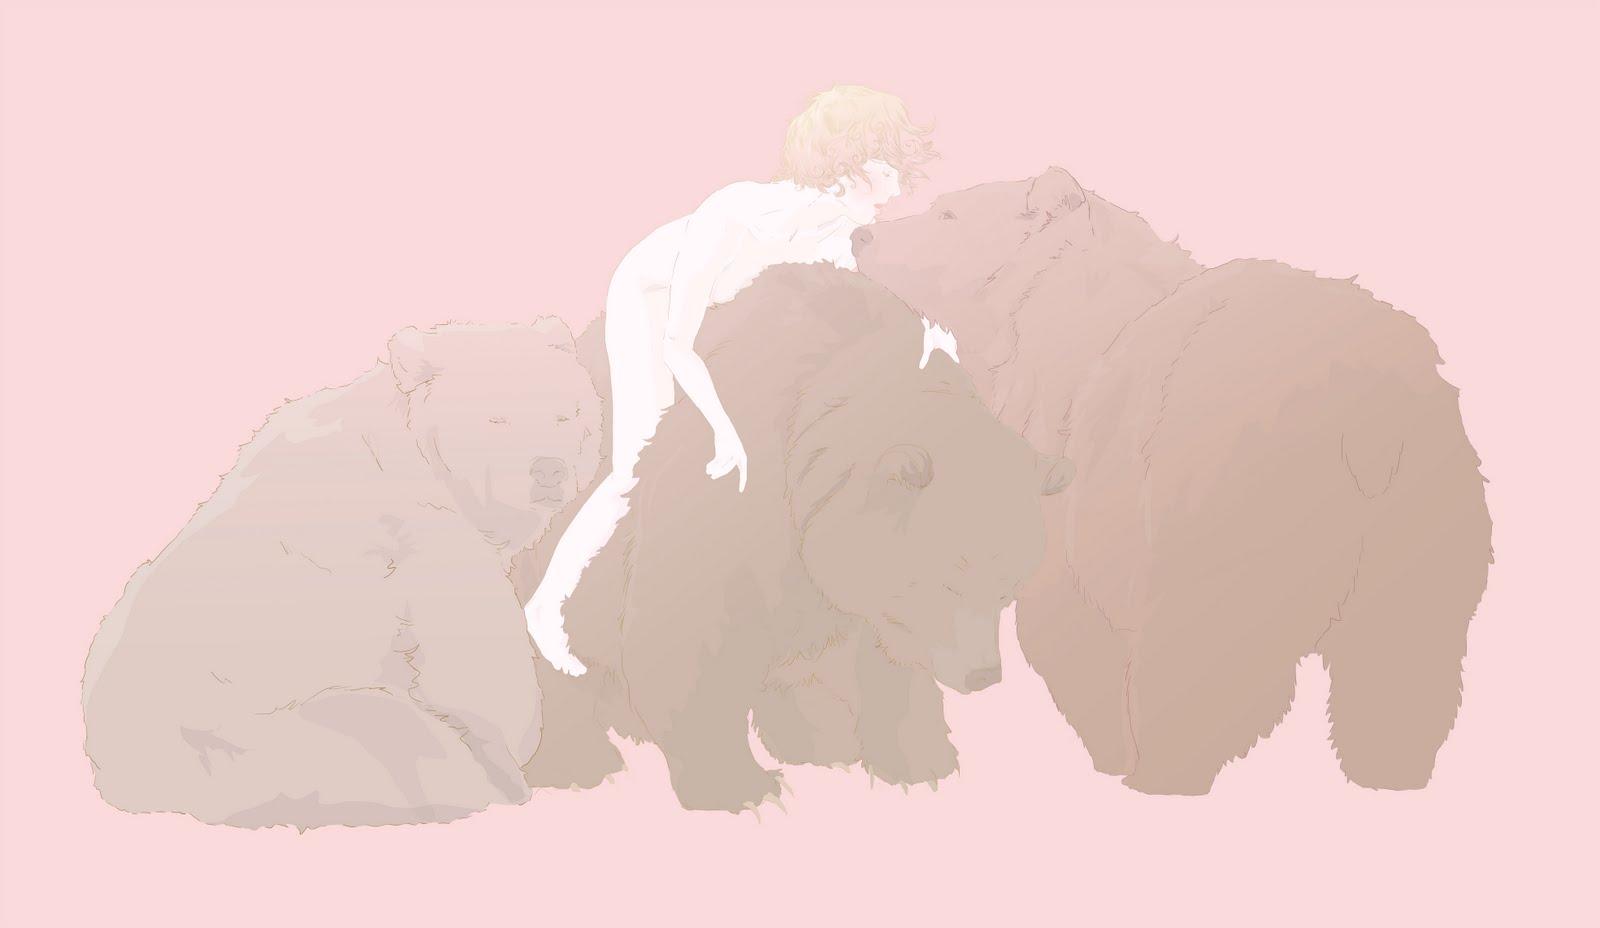 Goldilocksa and the three Bears